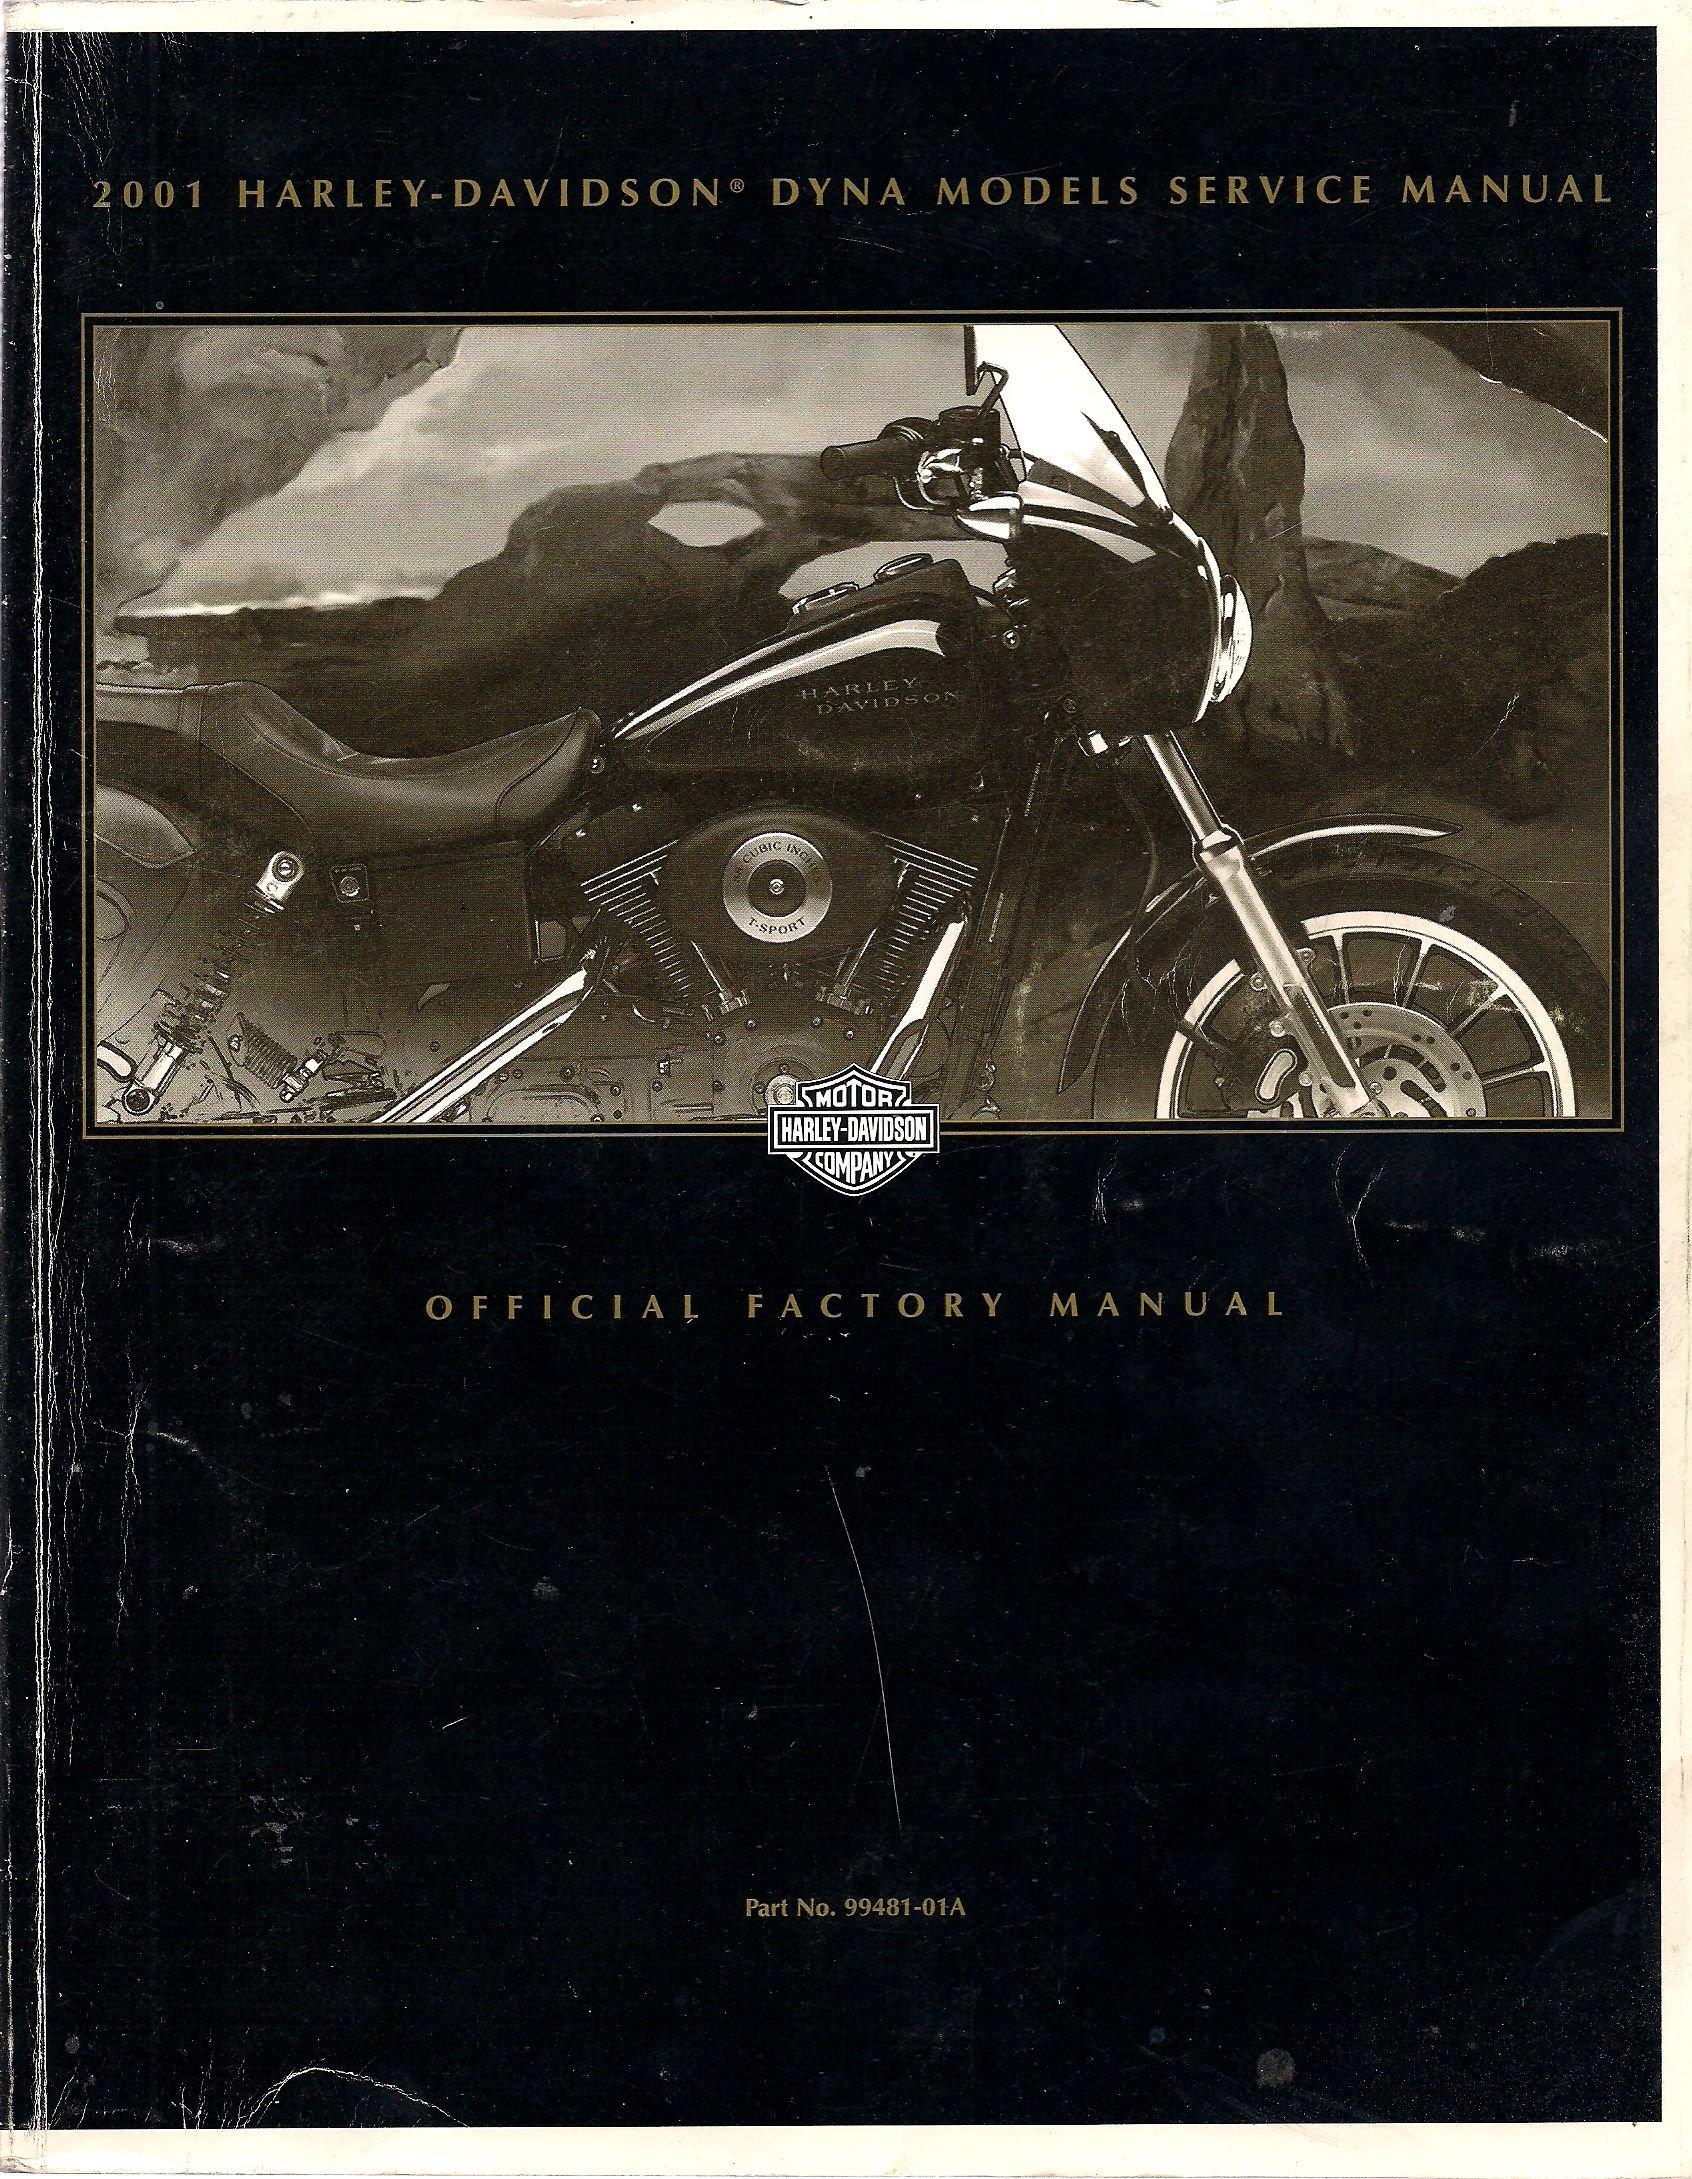 2001 Harley Davidson Dyna Models Service Manual (2001 Dyna Glide): Harley  Davidson: Amazon.com: Books